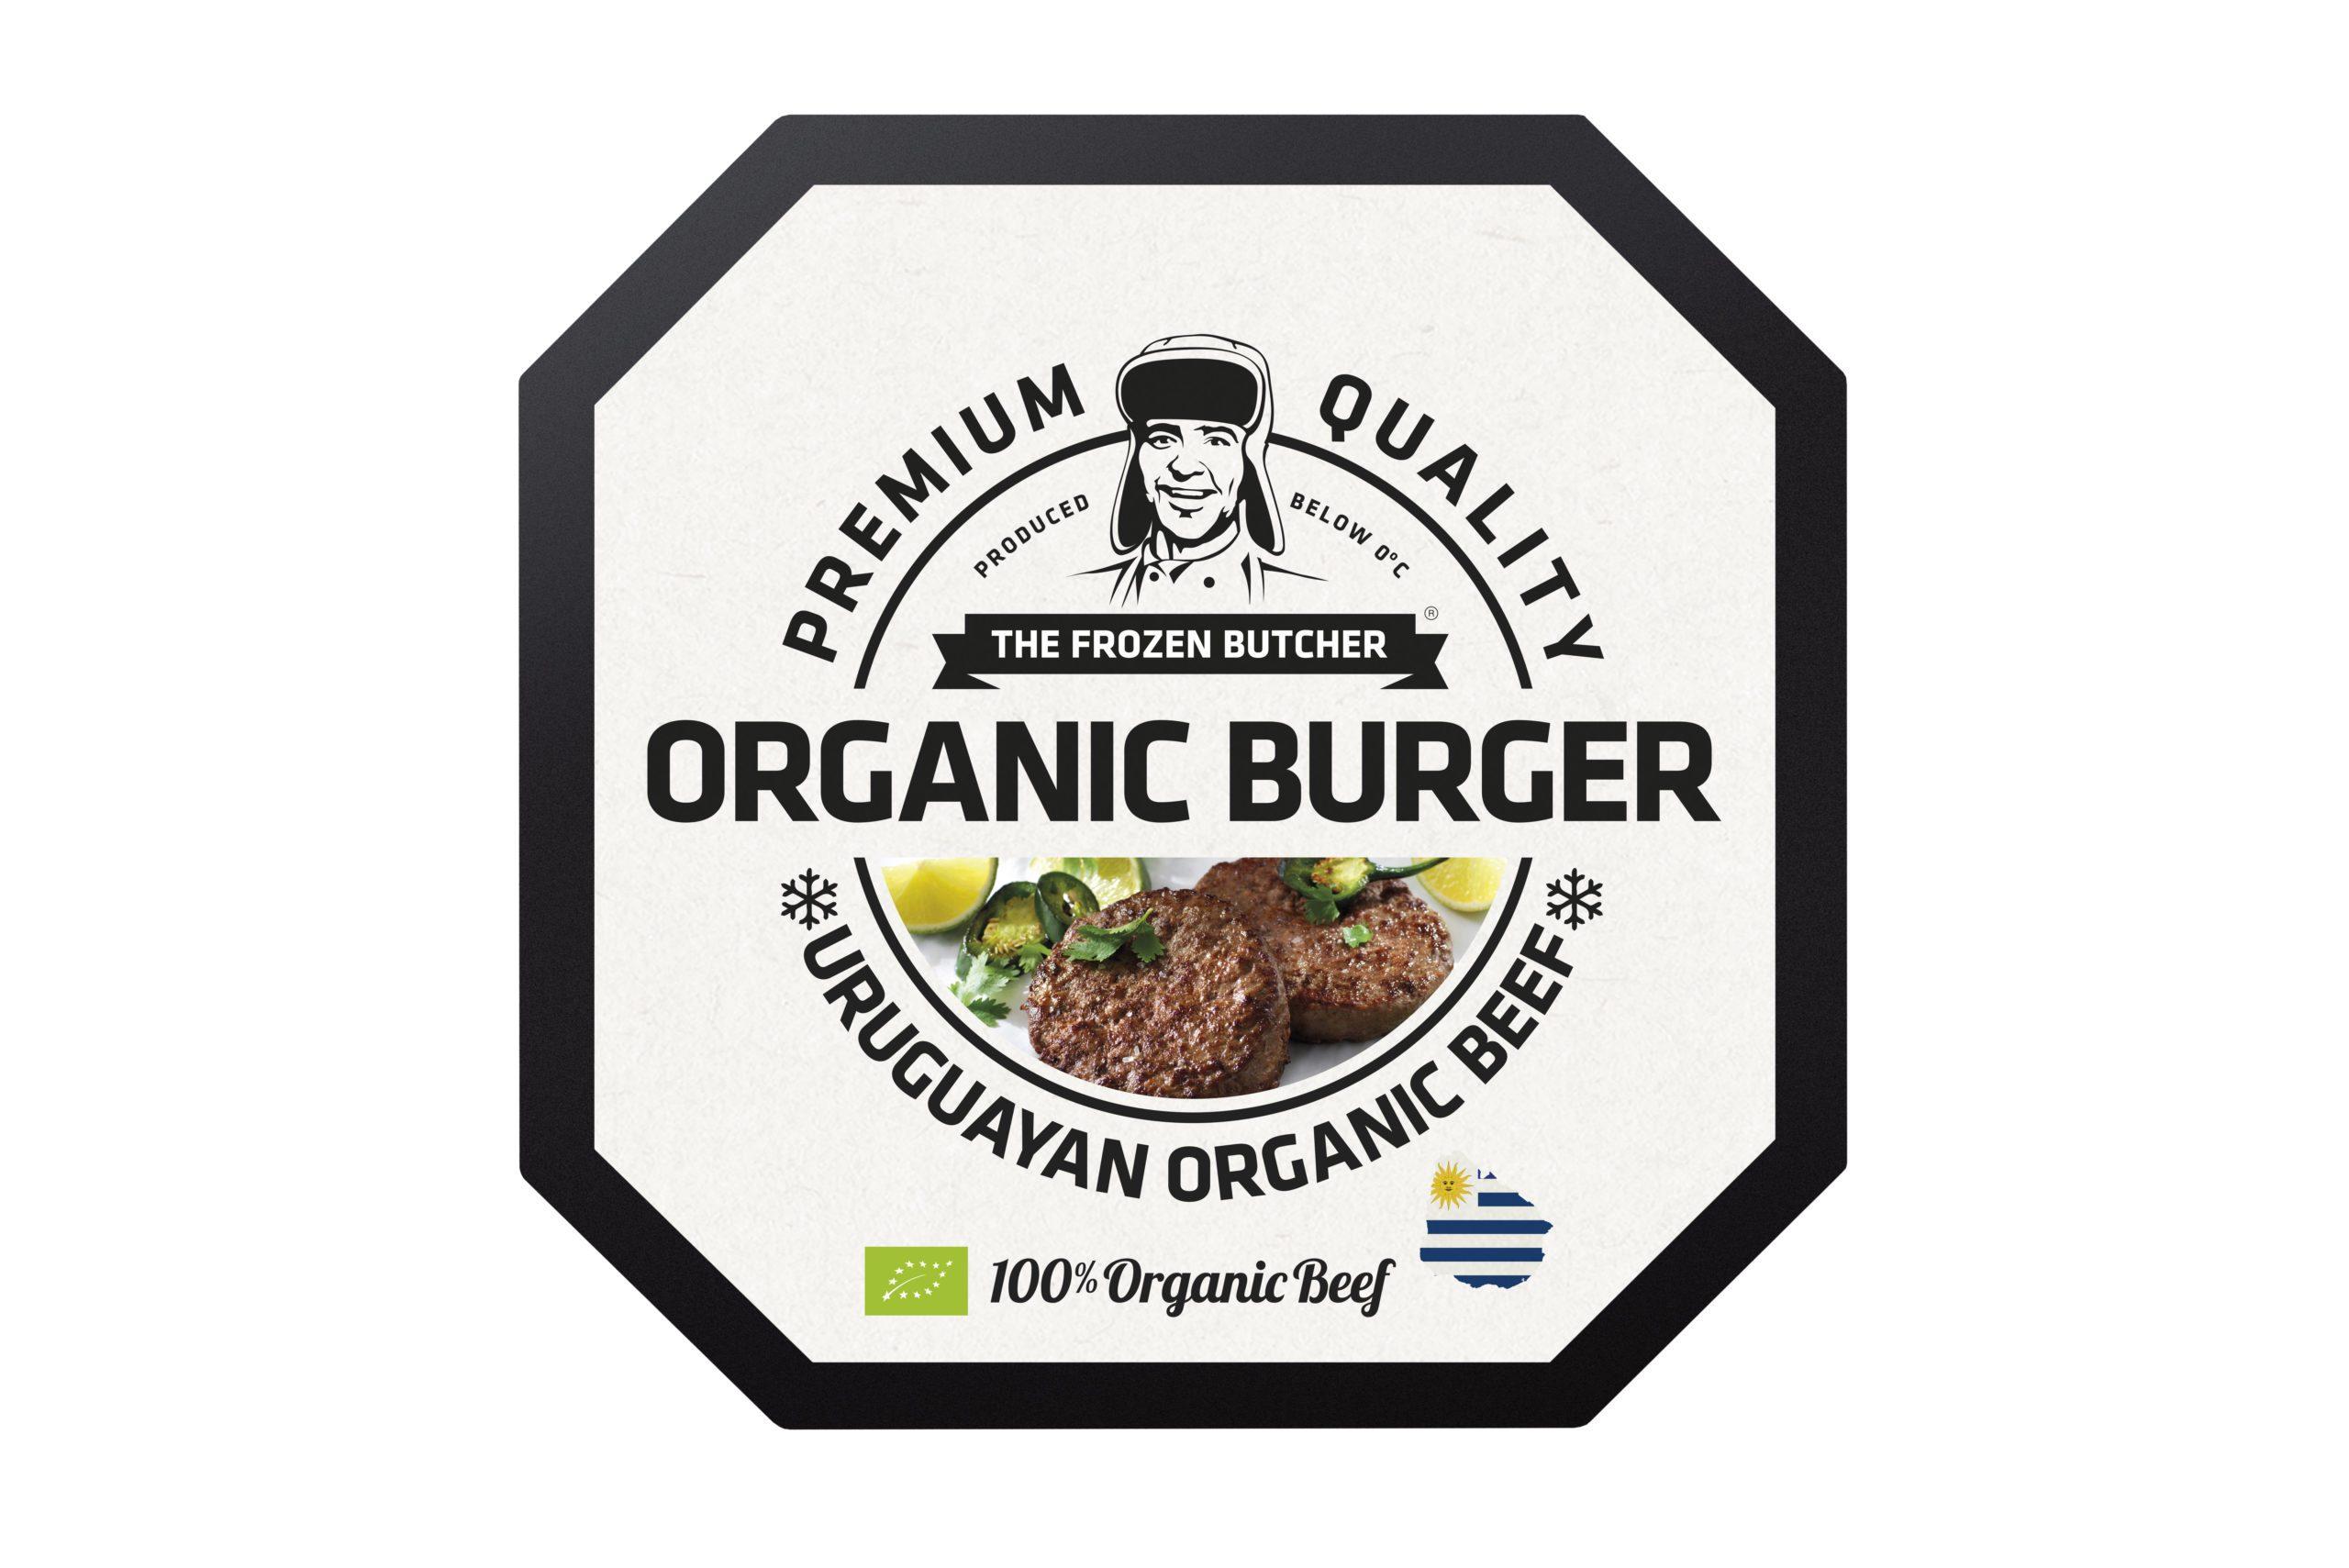 FrozenButcher_Organic burger (2)(1)